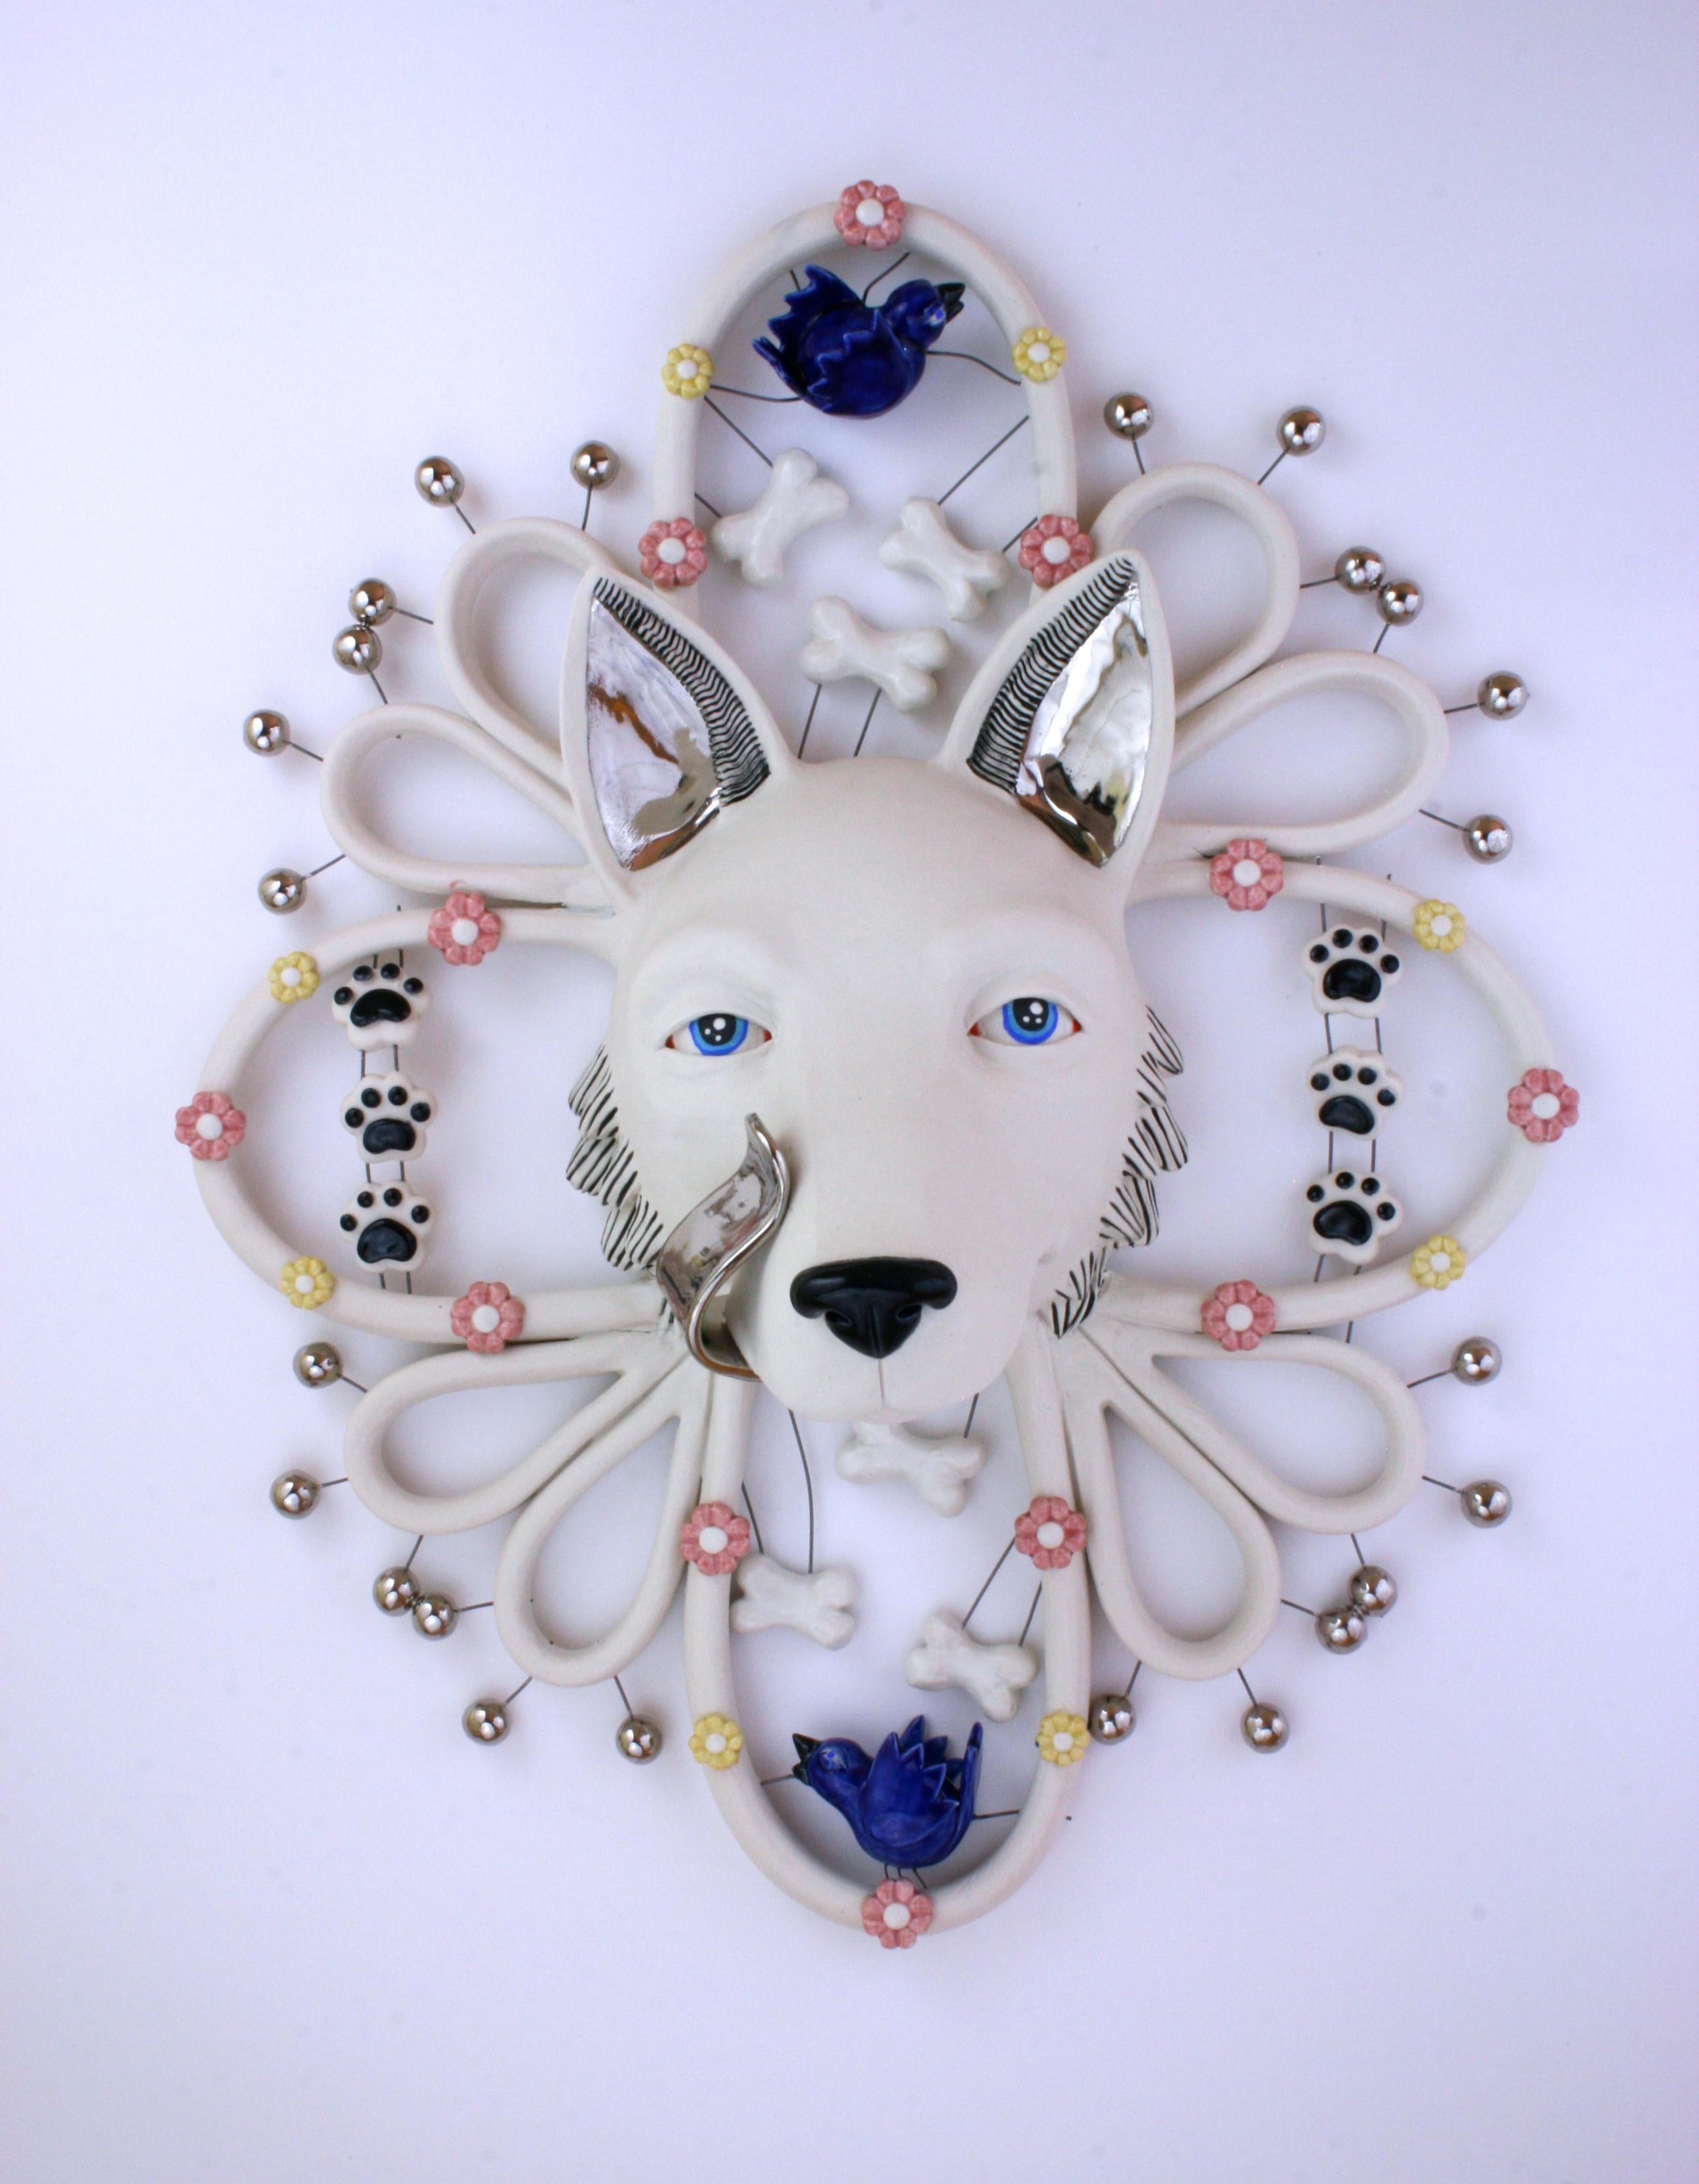 SILVER TONGUED WOLF - porcelain ceramic sculpture of wolf, bones, birds, flowers